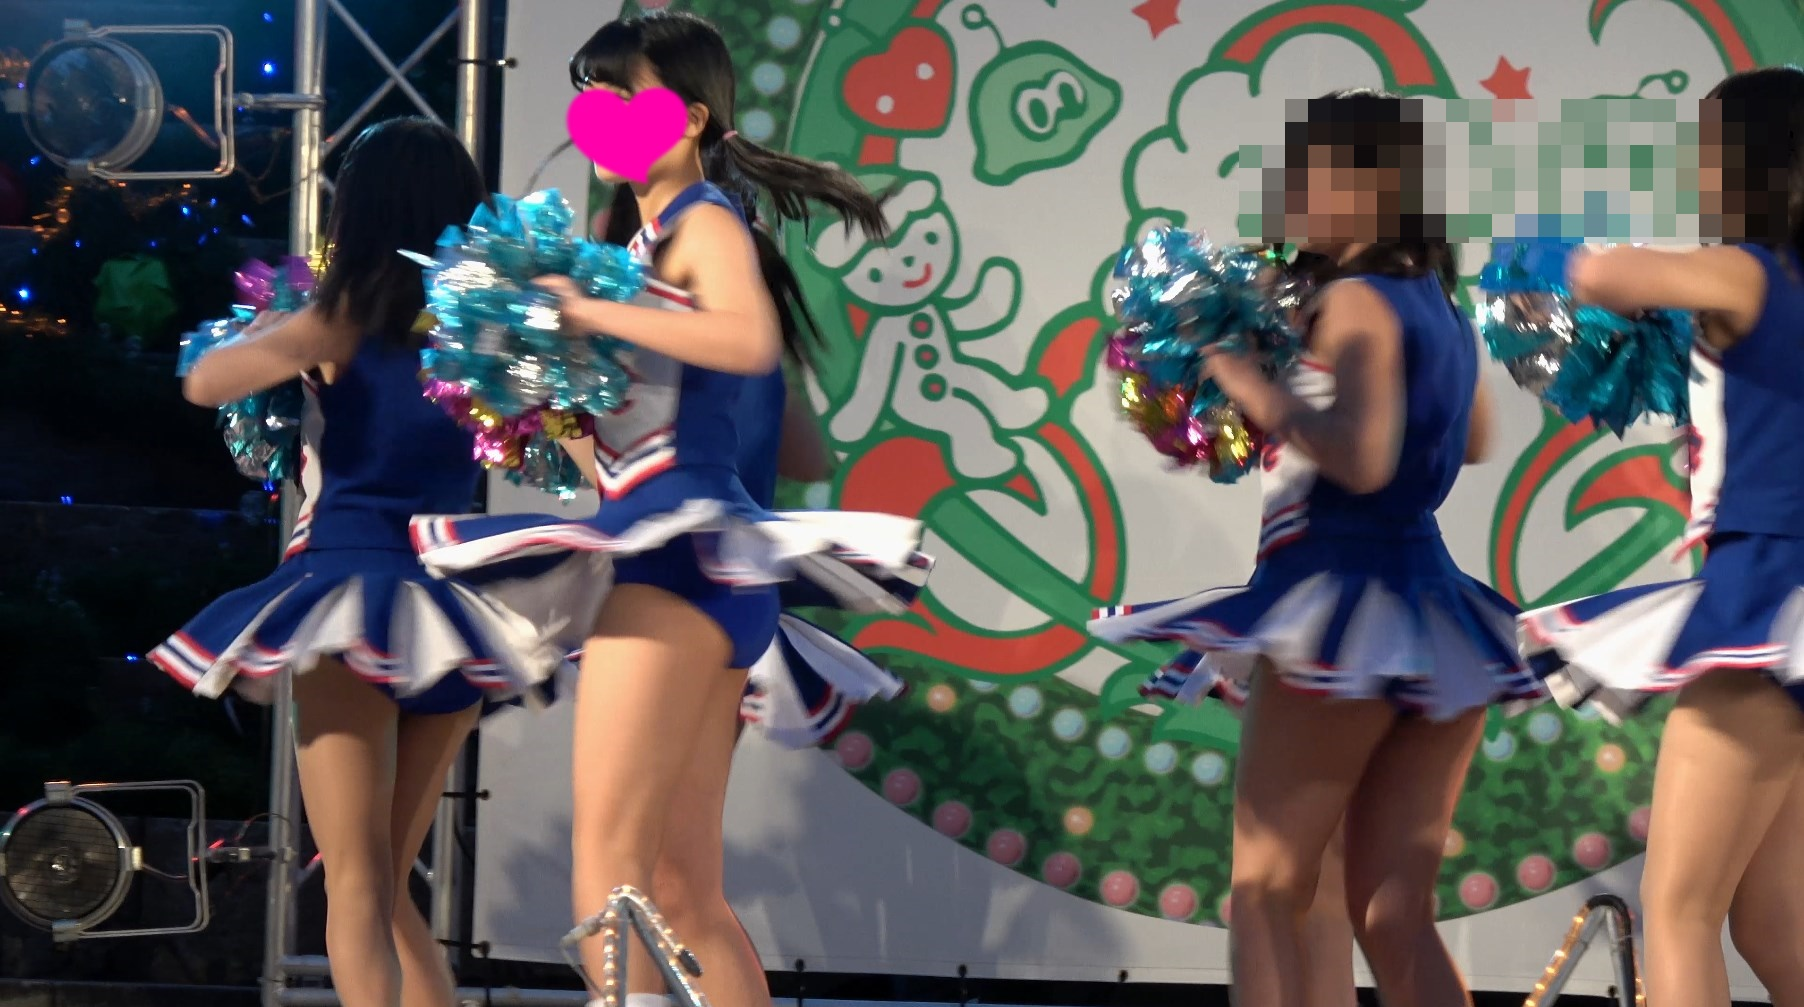 【4K高画質】チア2 無名青アンスコチームなのに可愛すぎ!全員アイドル並奇跡の世代!Part1【超Kの者】